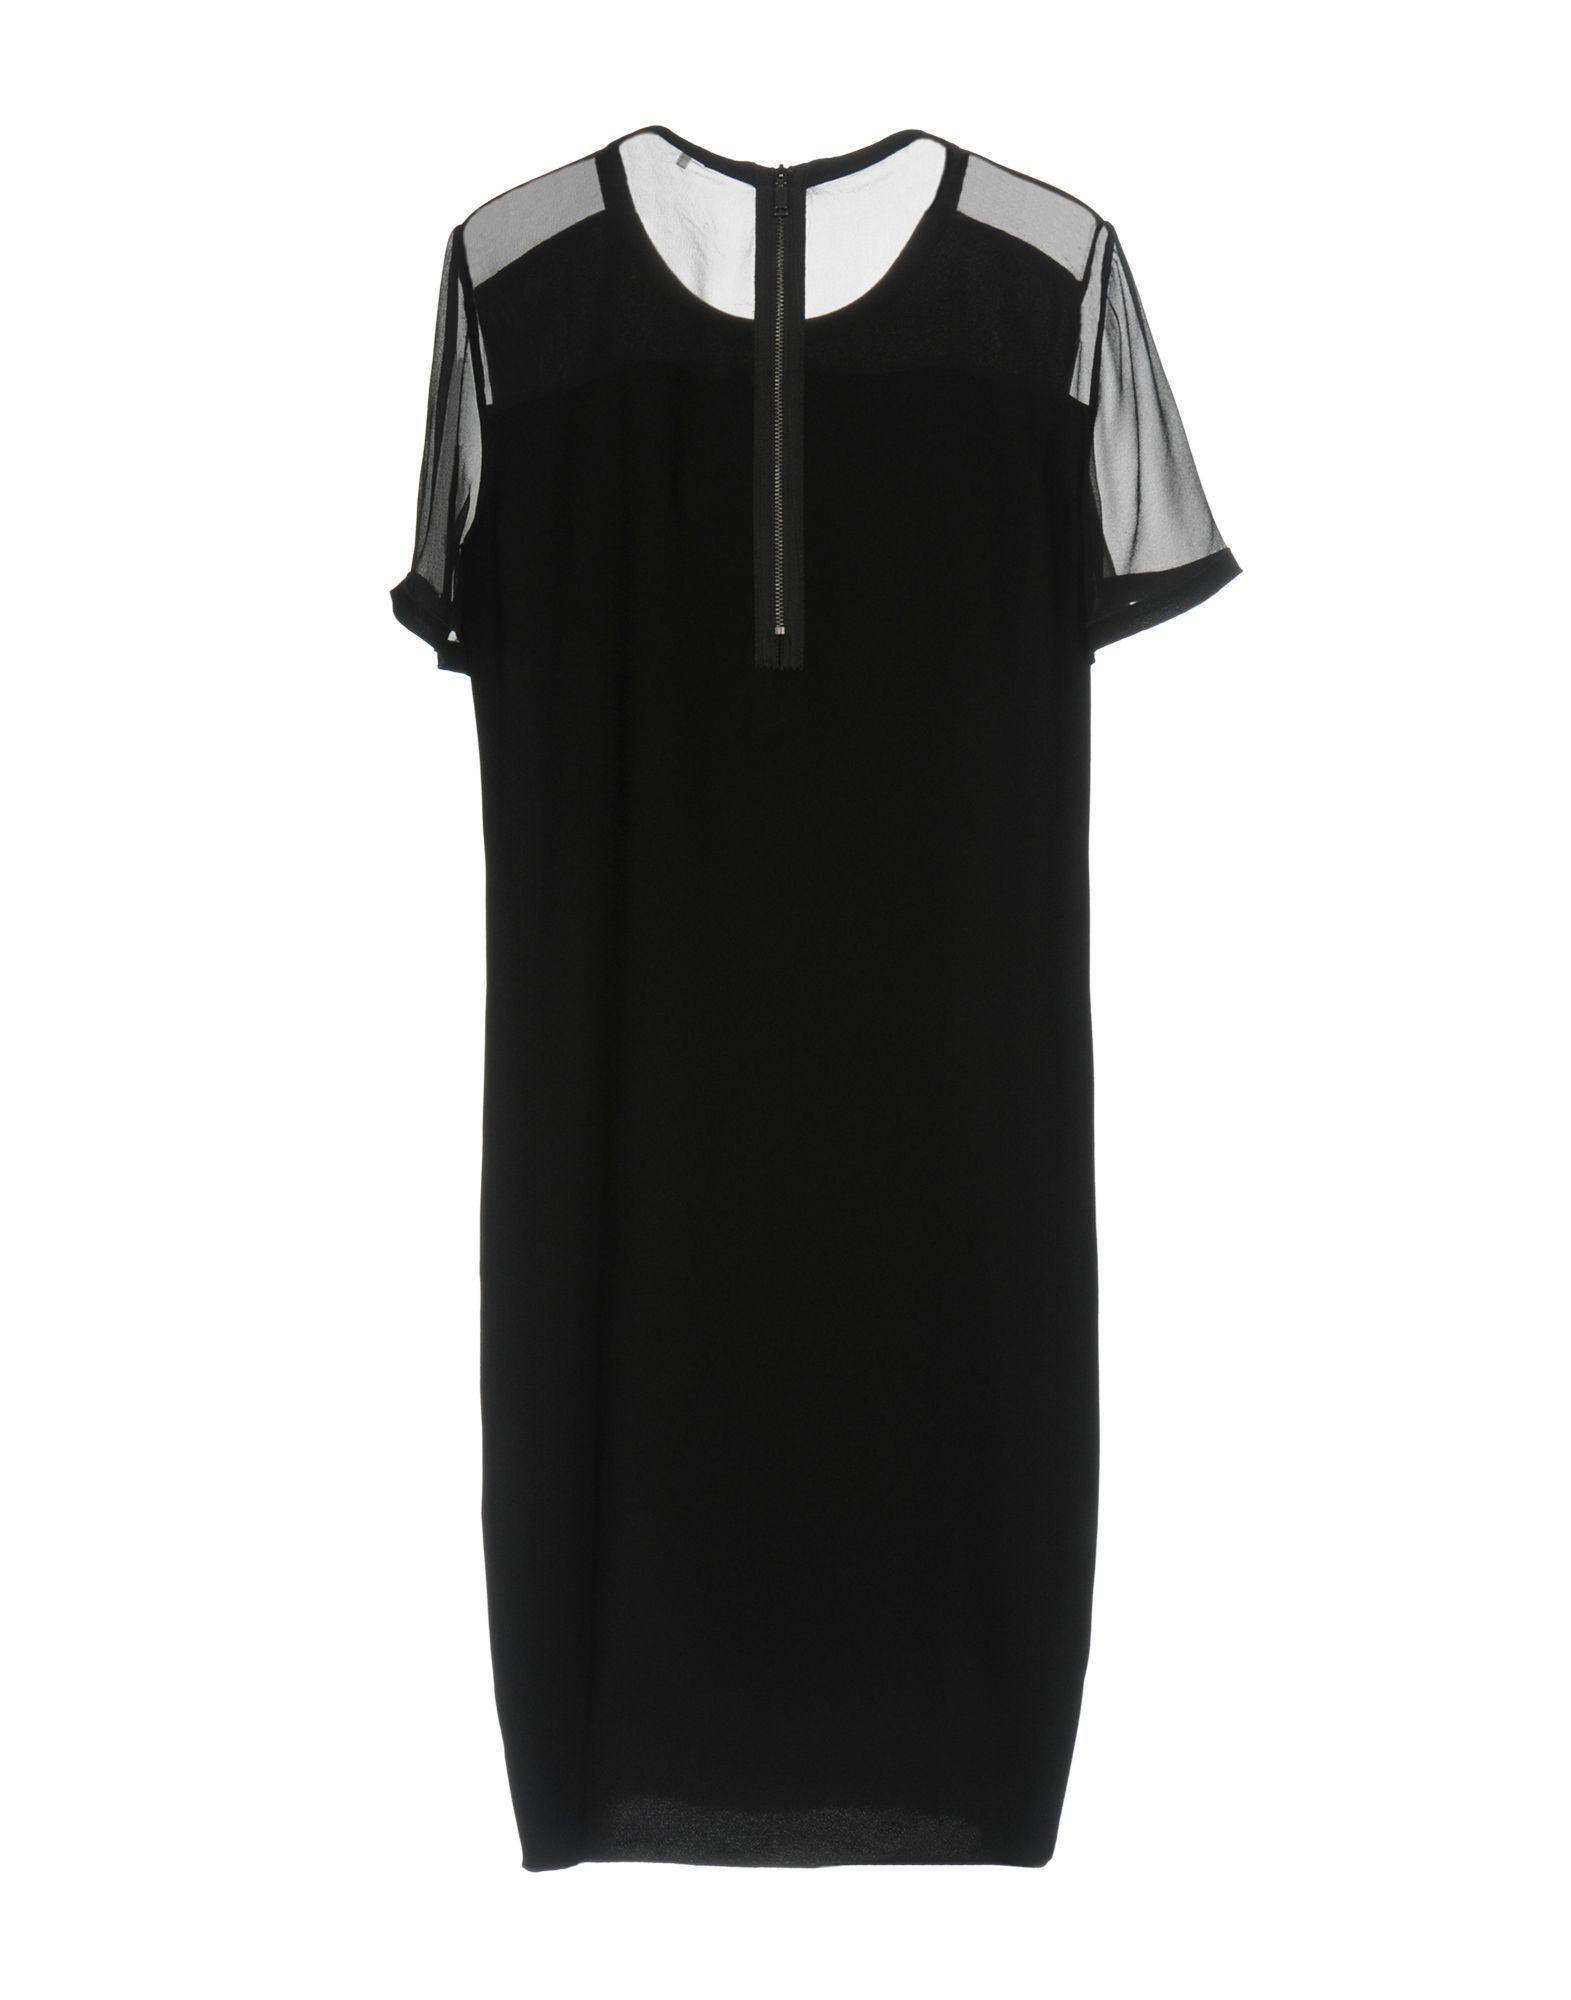 DRESSES Elie Tahari Black Woman Triacetate